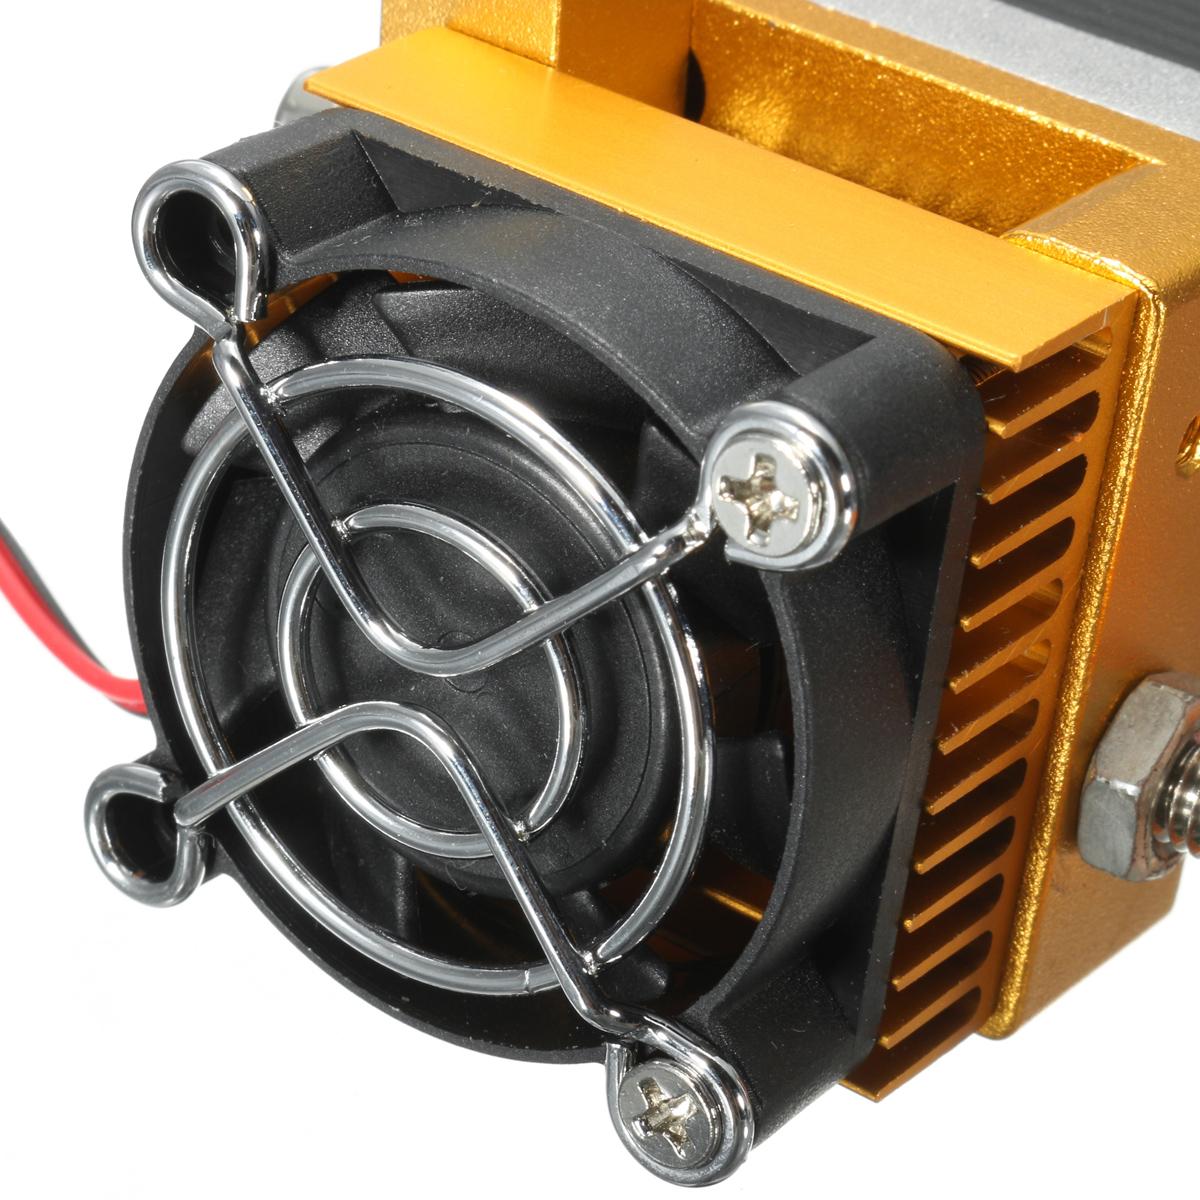 MK8 Extruder 0.4mm Full Metal Nozzle Print Head For 3D Printer Prusa i3